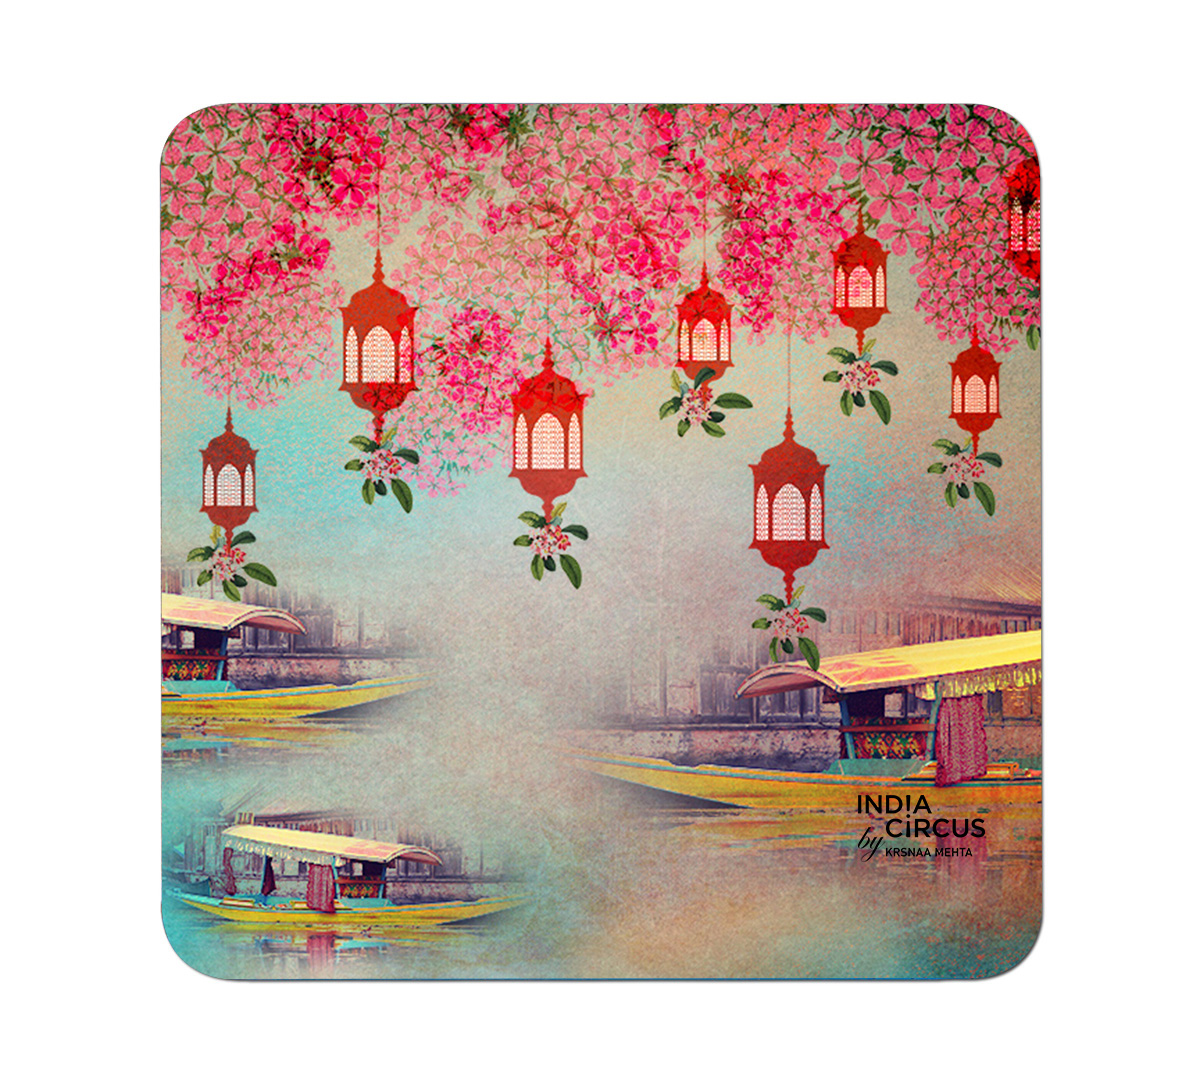 Scarlet Shadow PVC Table Coaster (Set of 6)